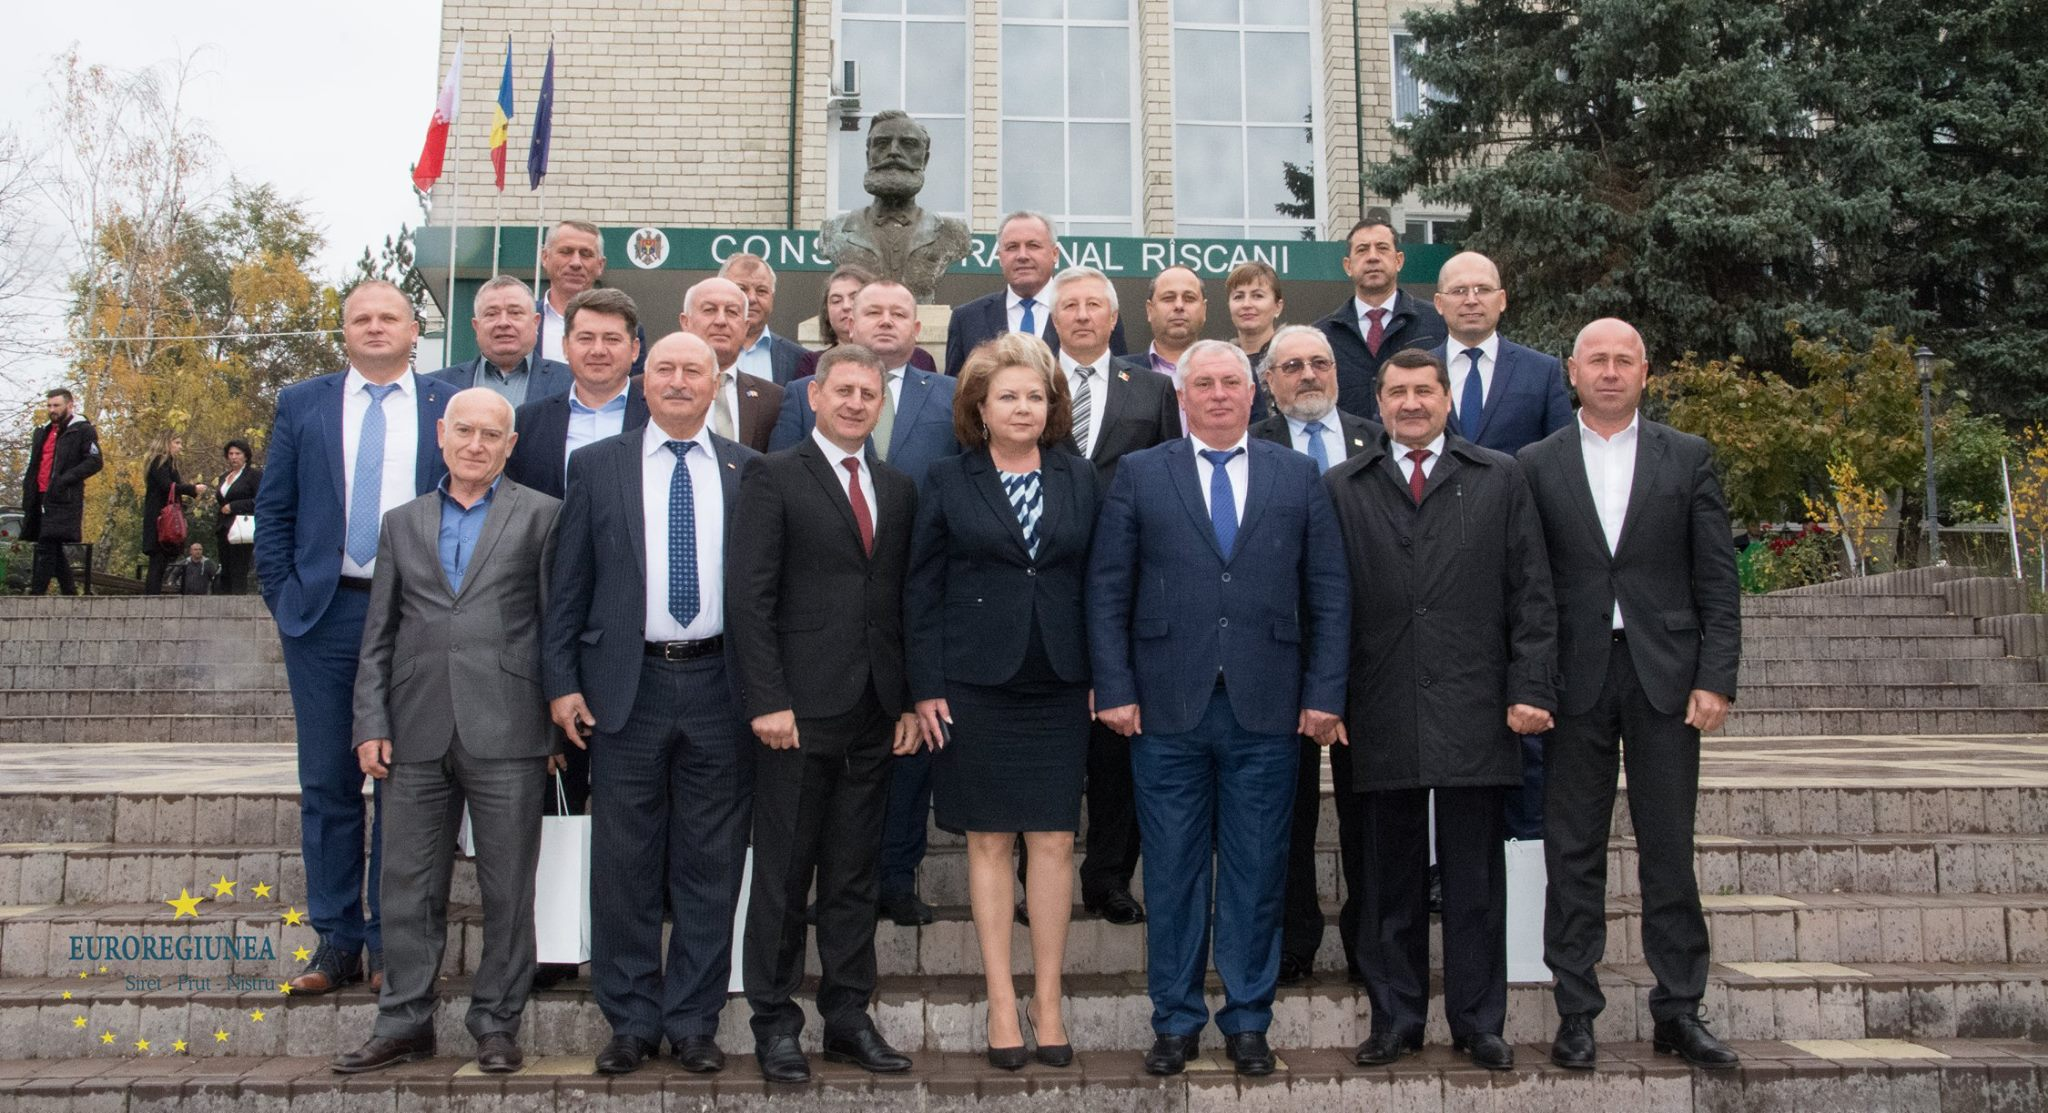 "<a class=""amazingslider-posttitle-link"" href=""http://www.euroregiune.org/sedinta-ag-a-aespn-23-octombrie-riscani-republica-moldova/"" target=""_self"">Sedinta AG a AESPN - 23 octombrie Rîșcani, Republica Moldova</a>"